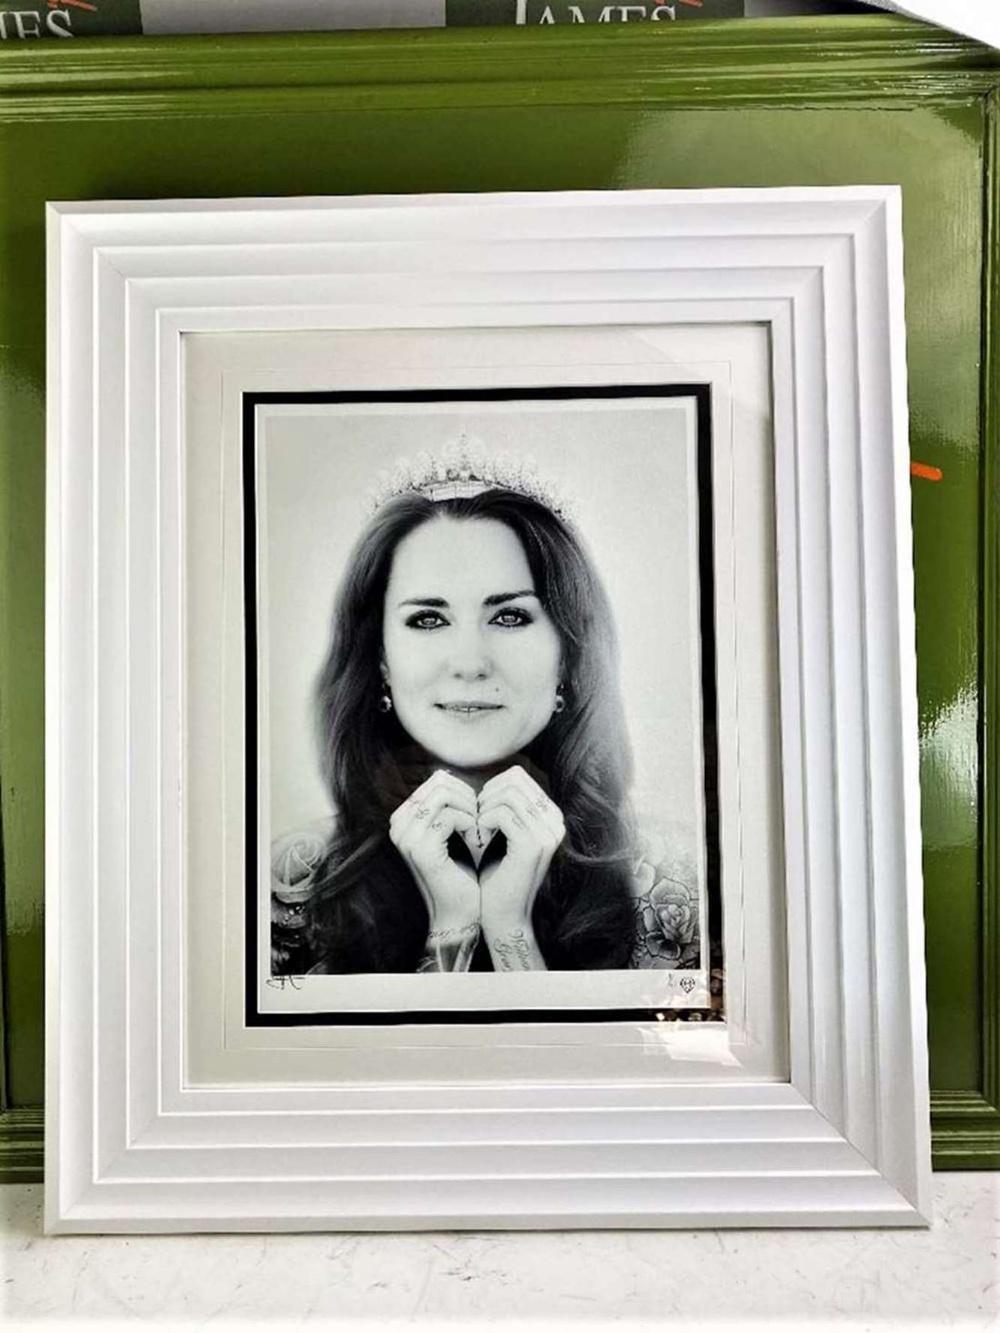 JJ Adams Kate Middleton Professionally Framed/Wishbone Edition - Image 2 of 2